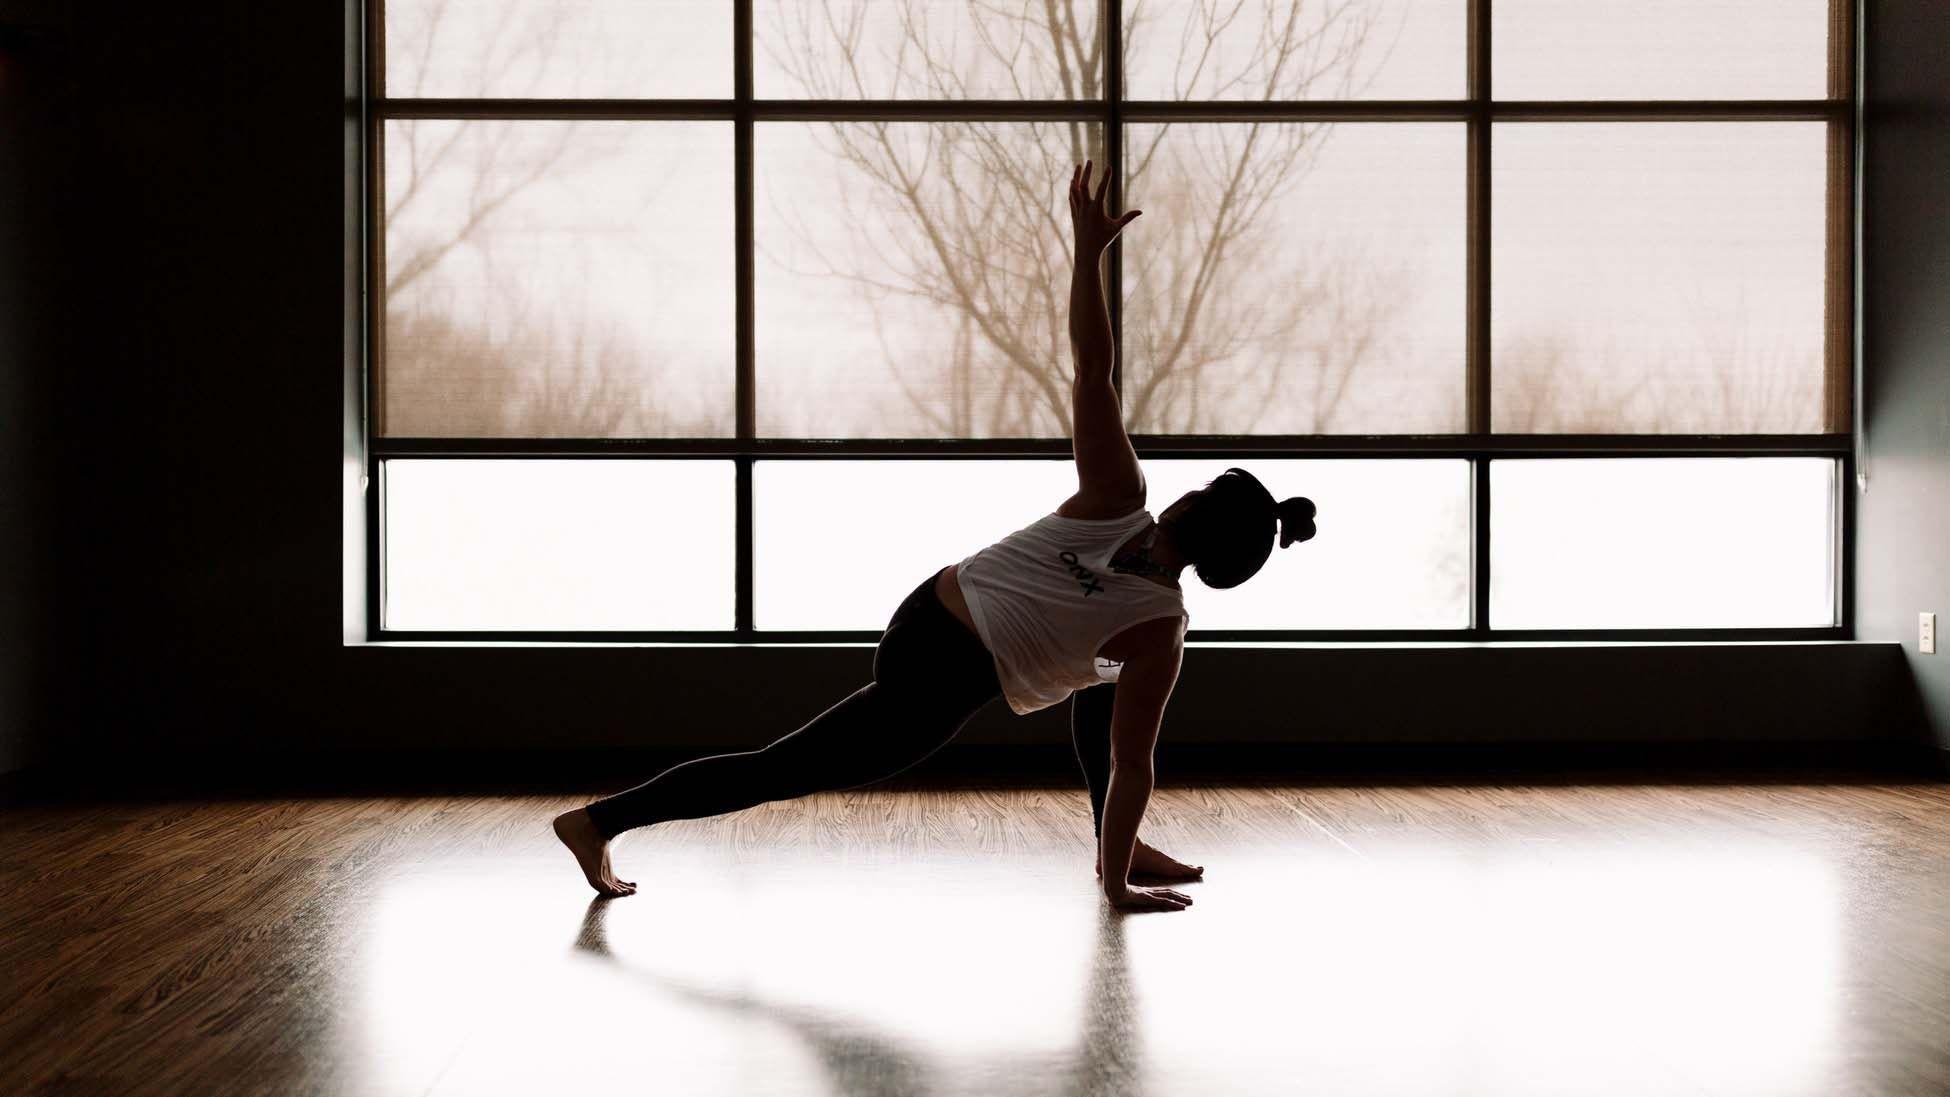 300 Hour Yoga Teacher Training in Winter Springs, Florida